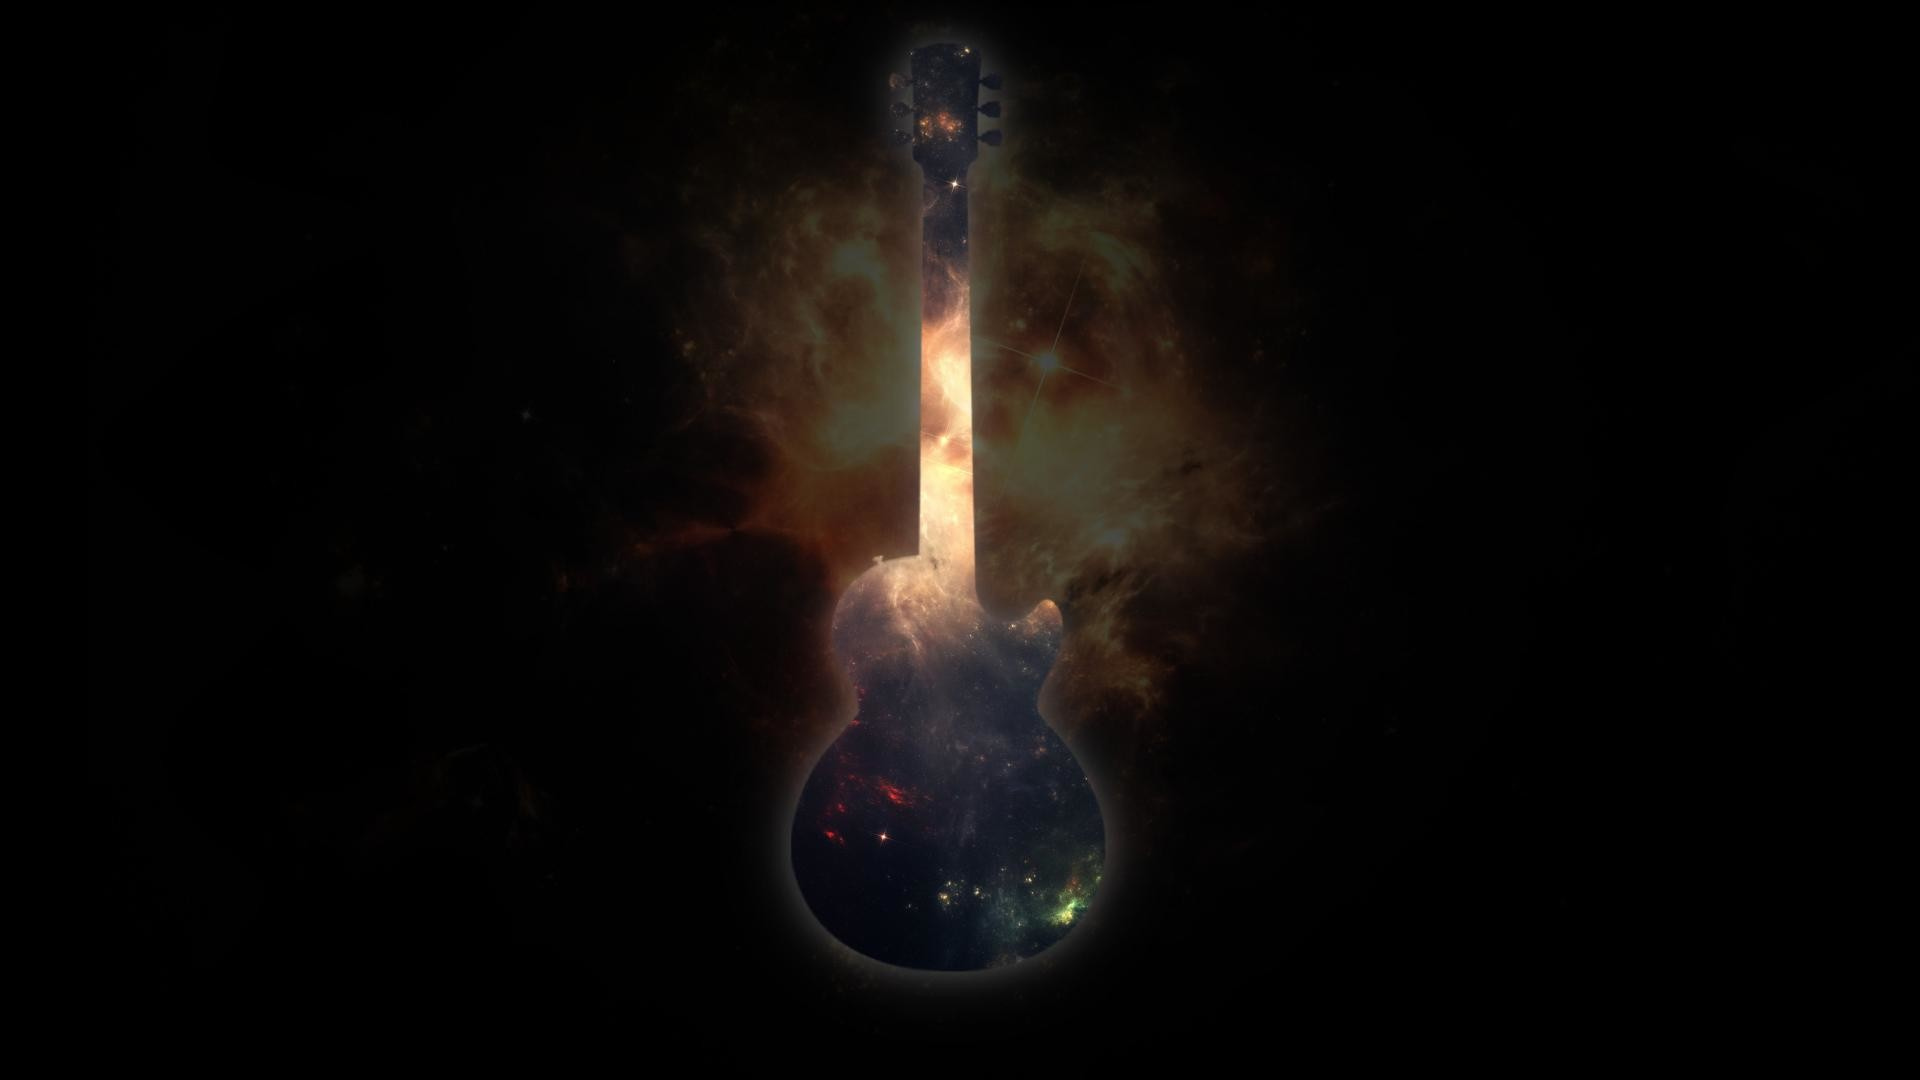 Gibson les paul rock music n roll wallpaper